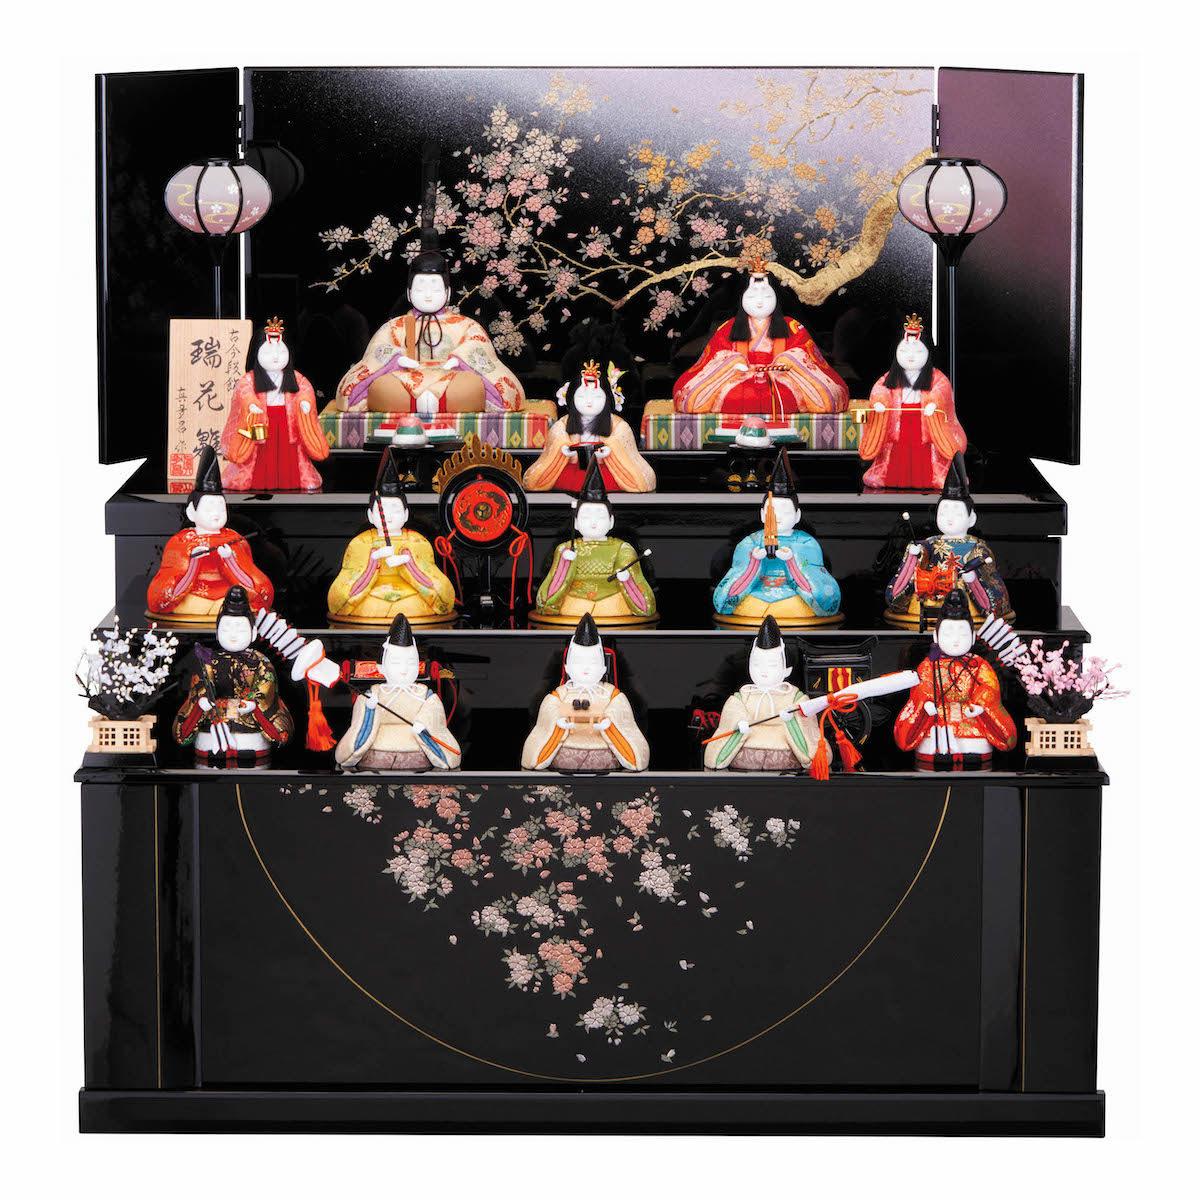 木目込人形 収納セット 真多呂 芙蓉雛 15人飾り 送料無料